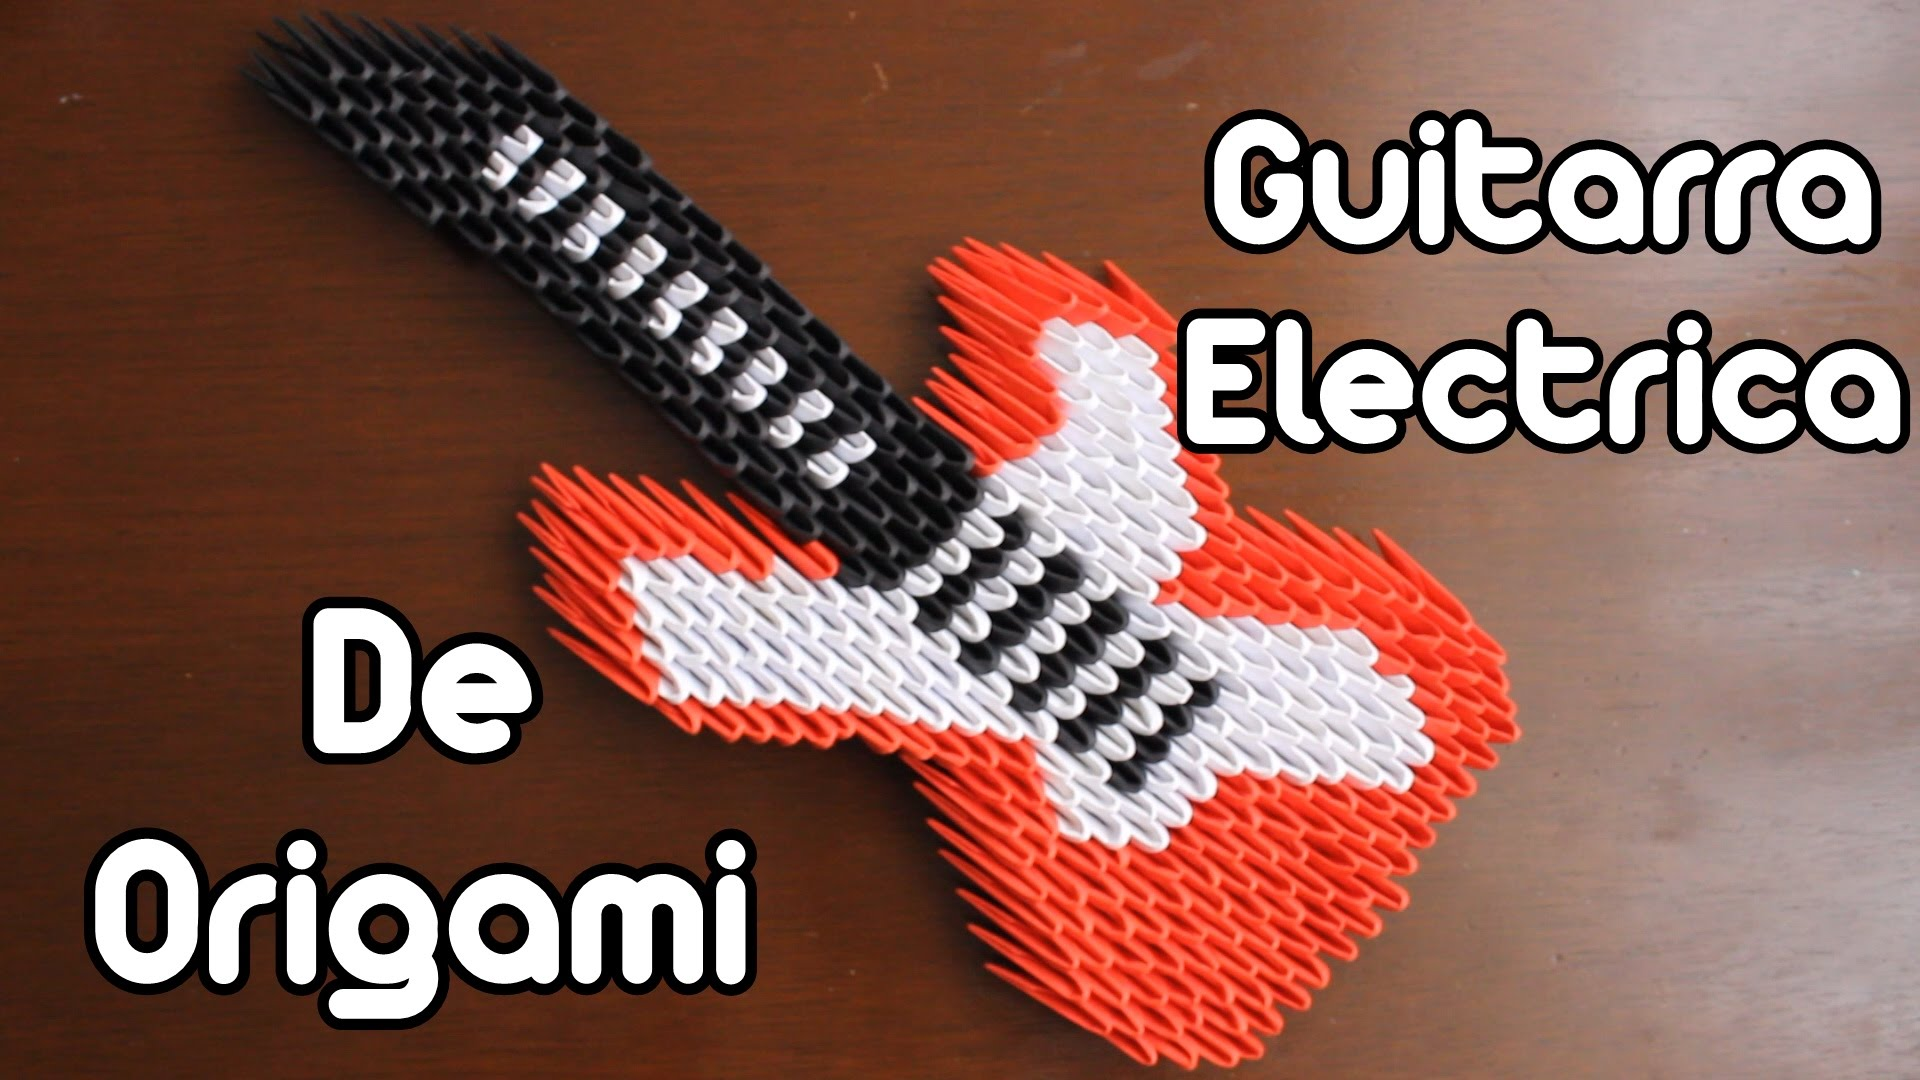 ORIGAMI 3D ELECTRIC GUITAR